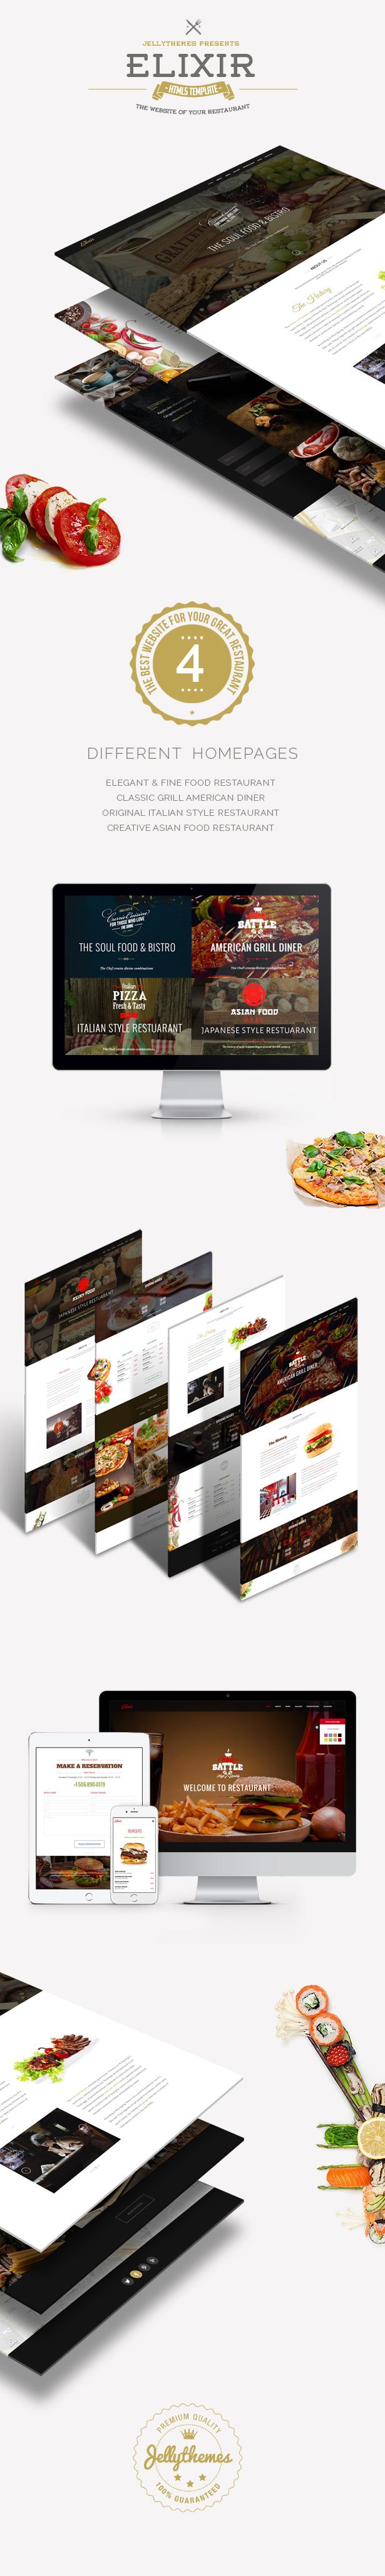 Elixir - Restaurant HTML Responsive Template - 2